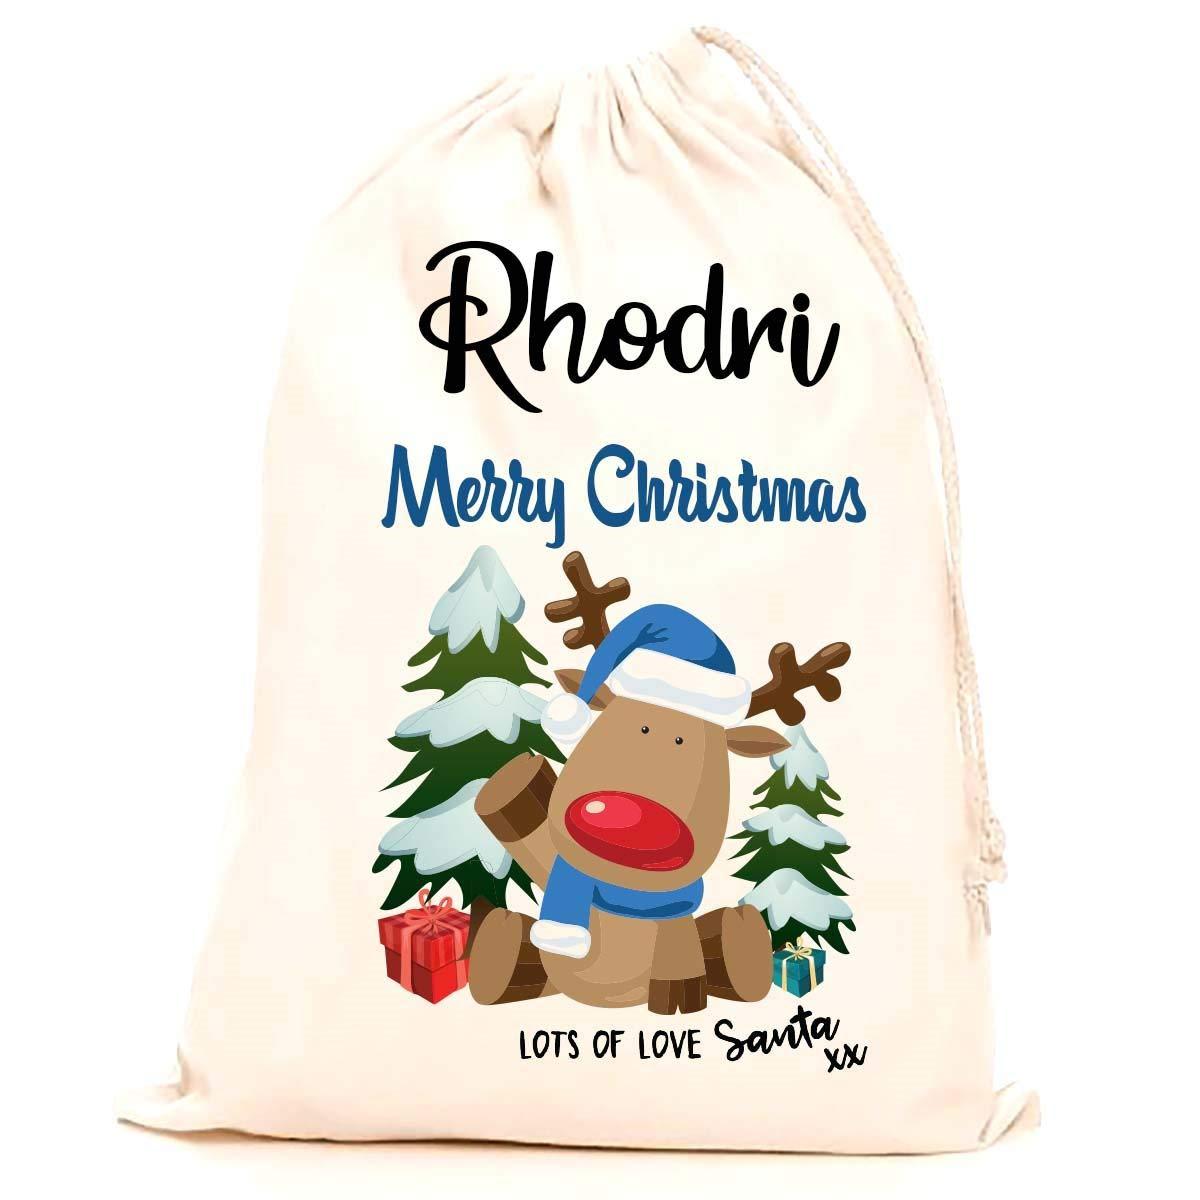 Children stocking printed with a blue reindeer 75x50cm 100/% Cotton Large Kids Treat Me Suite Rhodri personalised name Christmas santa sack making it the perfect keepsake xmas gift//present.